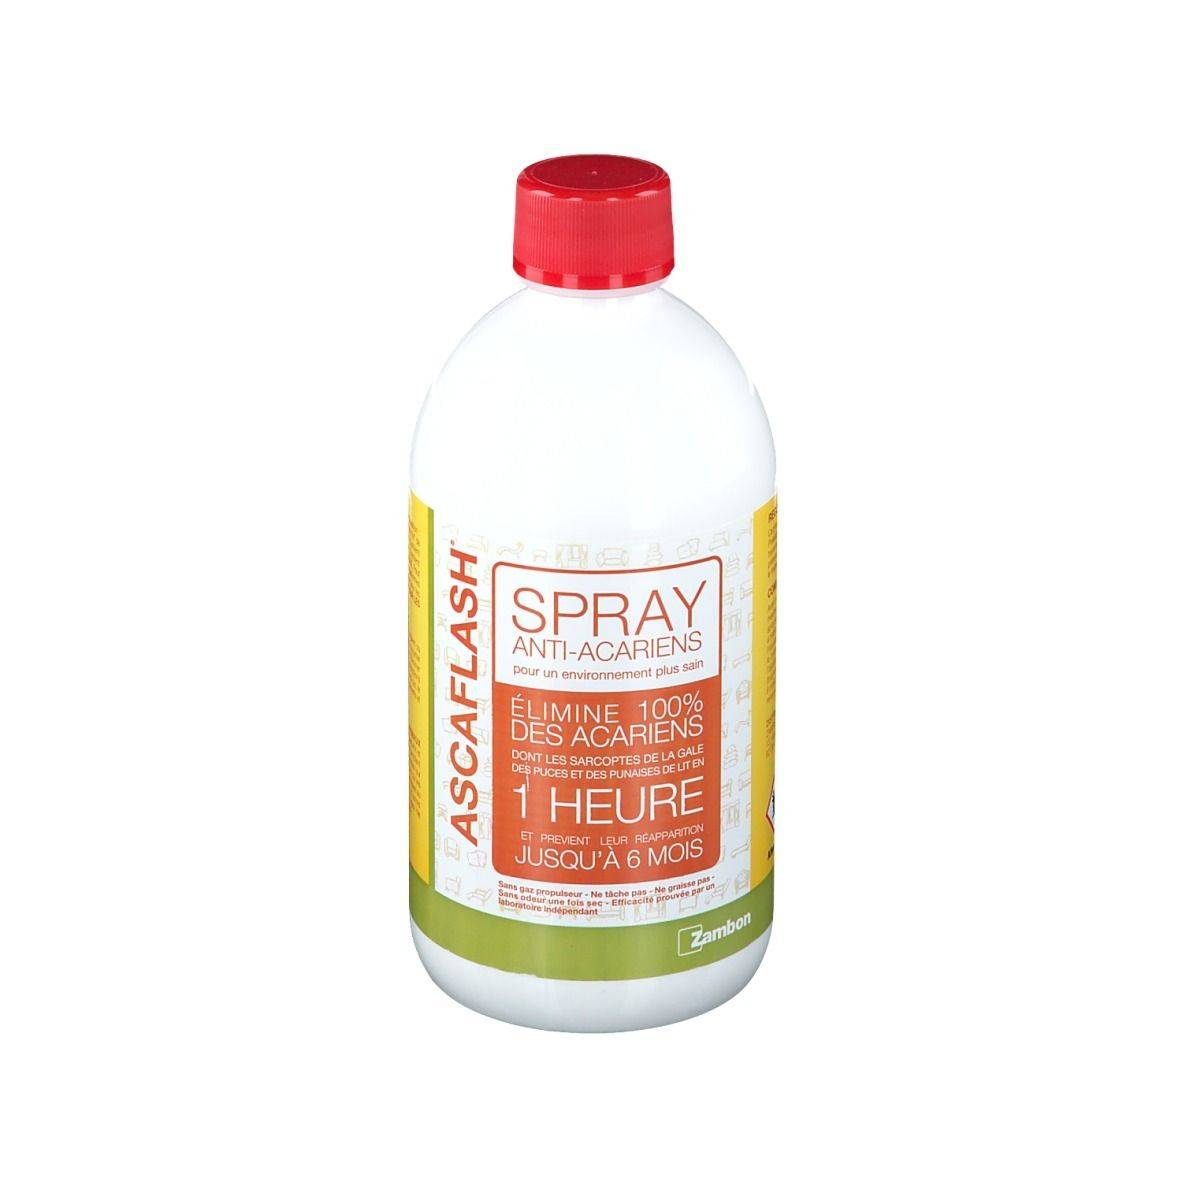 Ascaflash® Spray Anti-Acariens ml spray